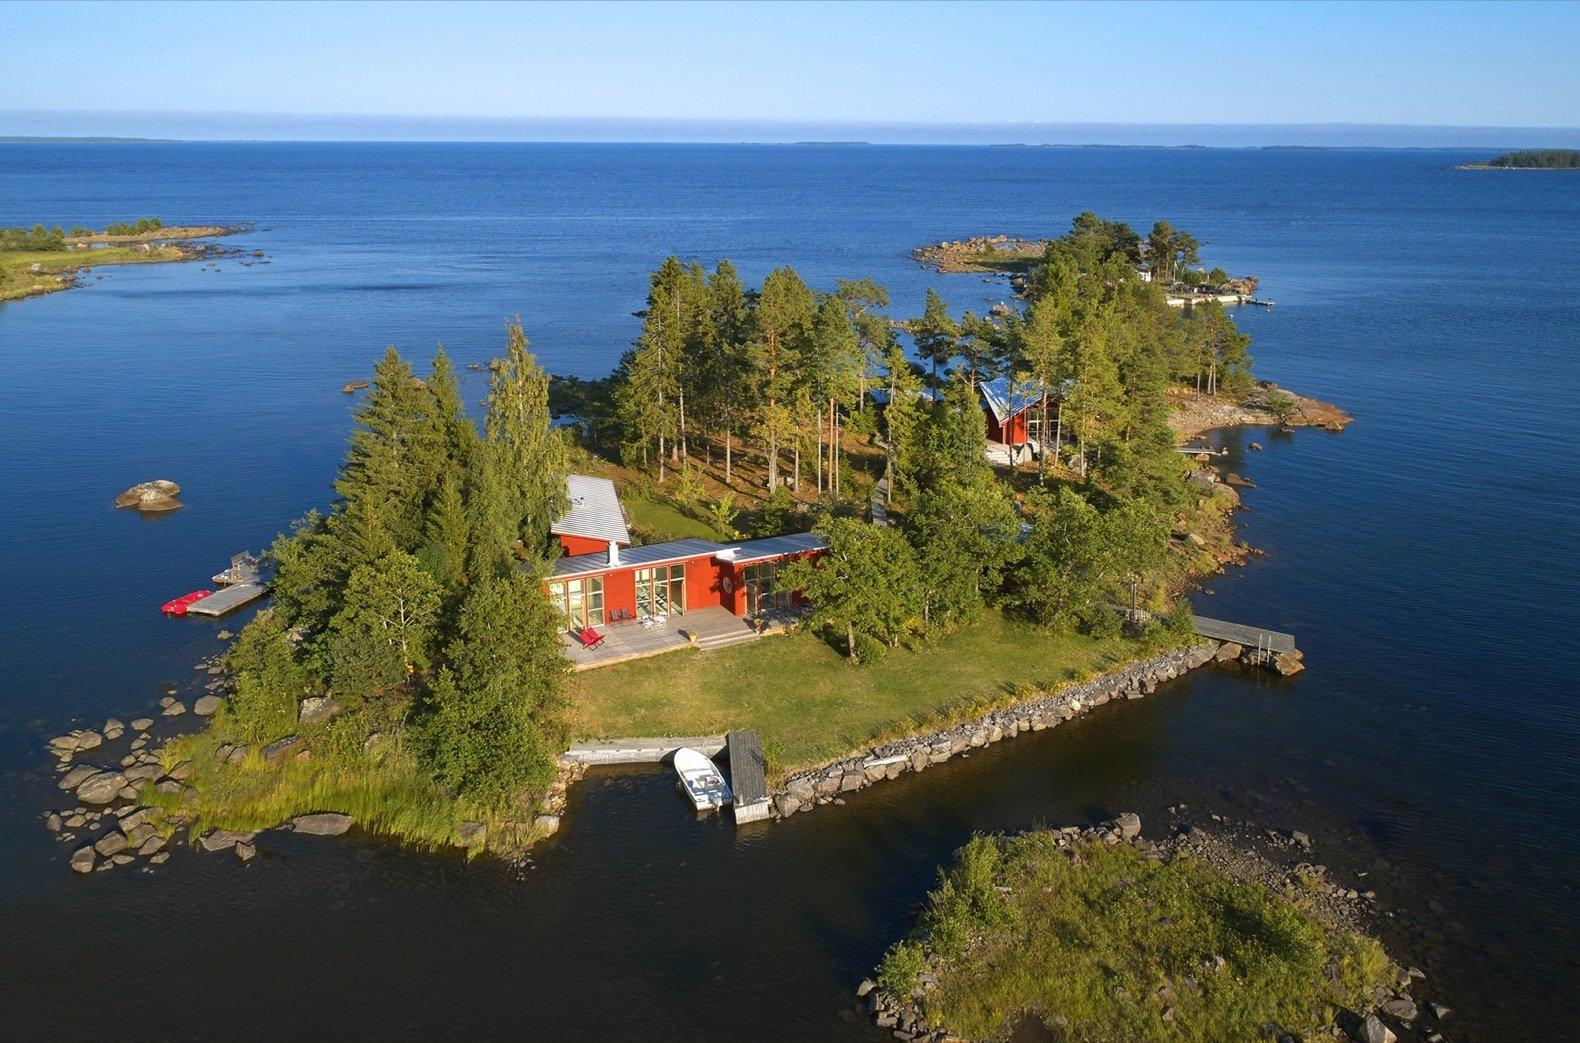 Gåsharsskäret island aerial view